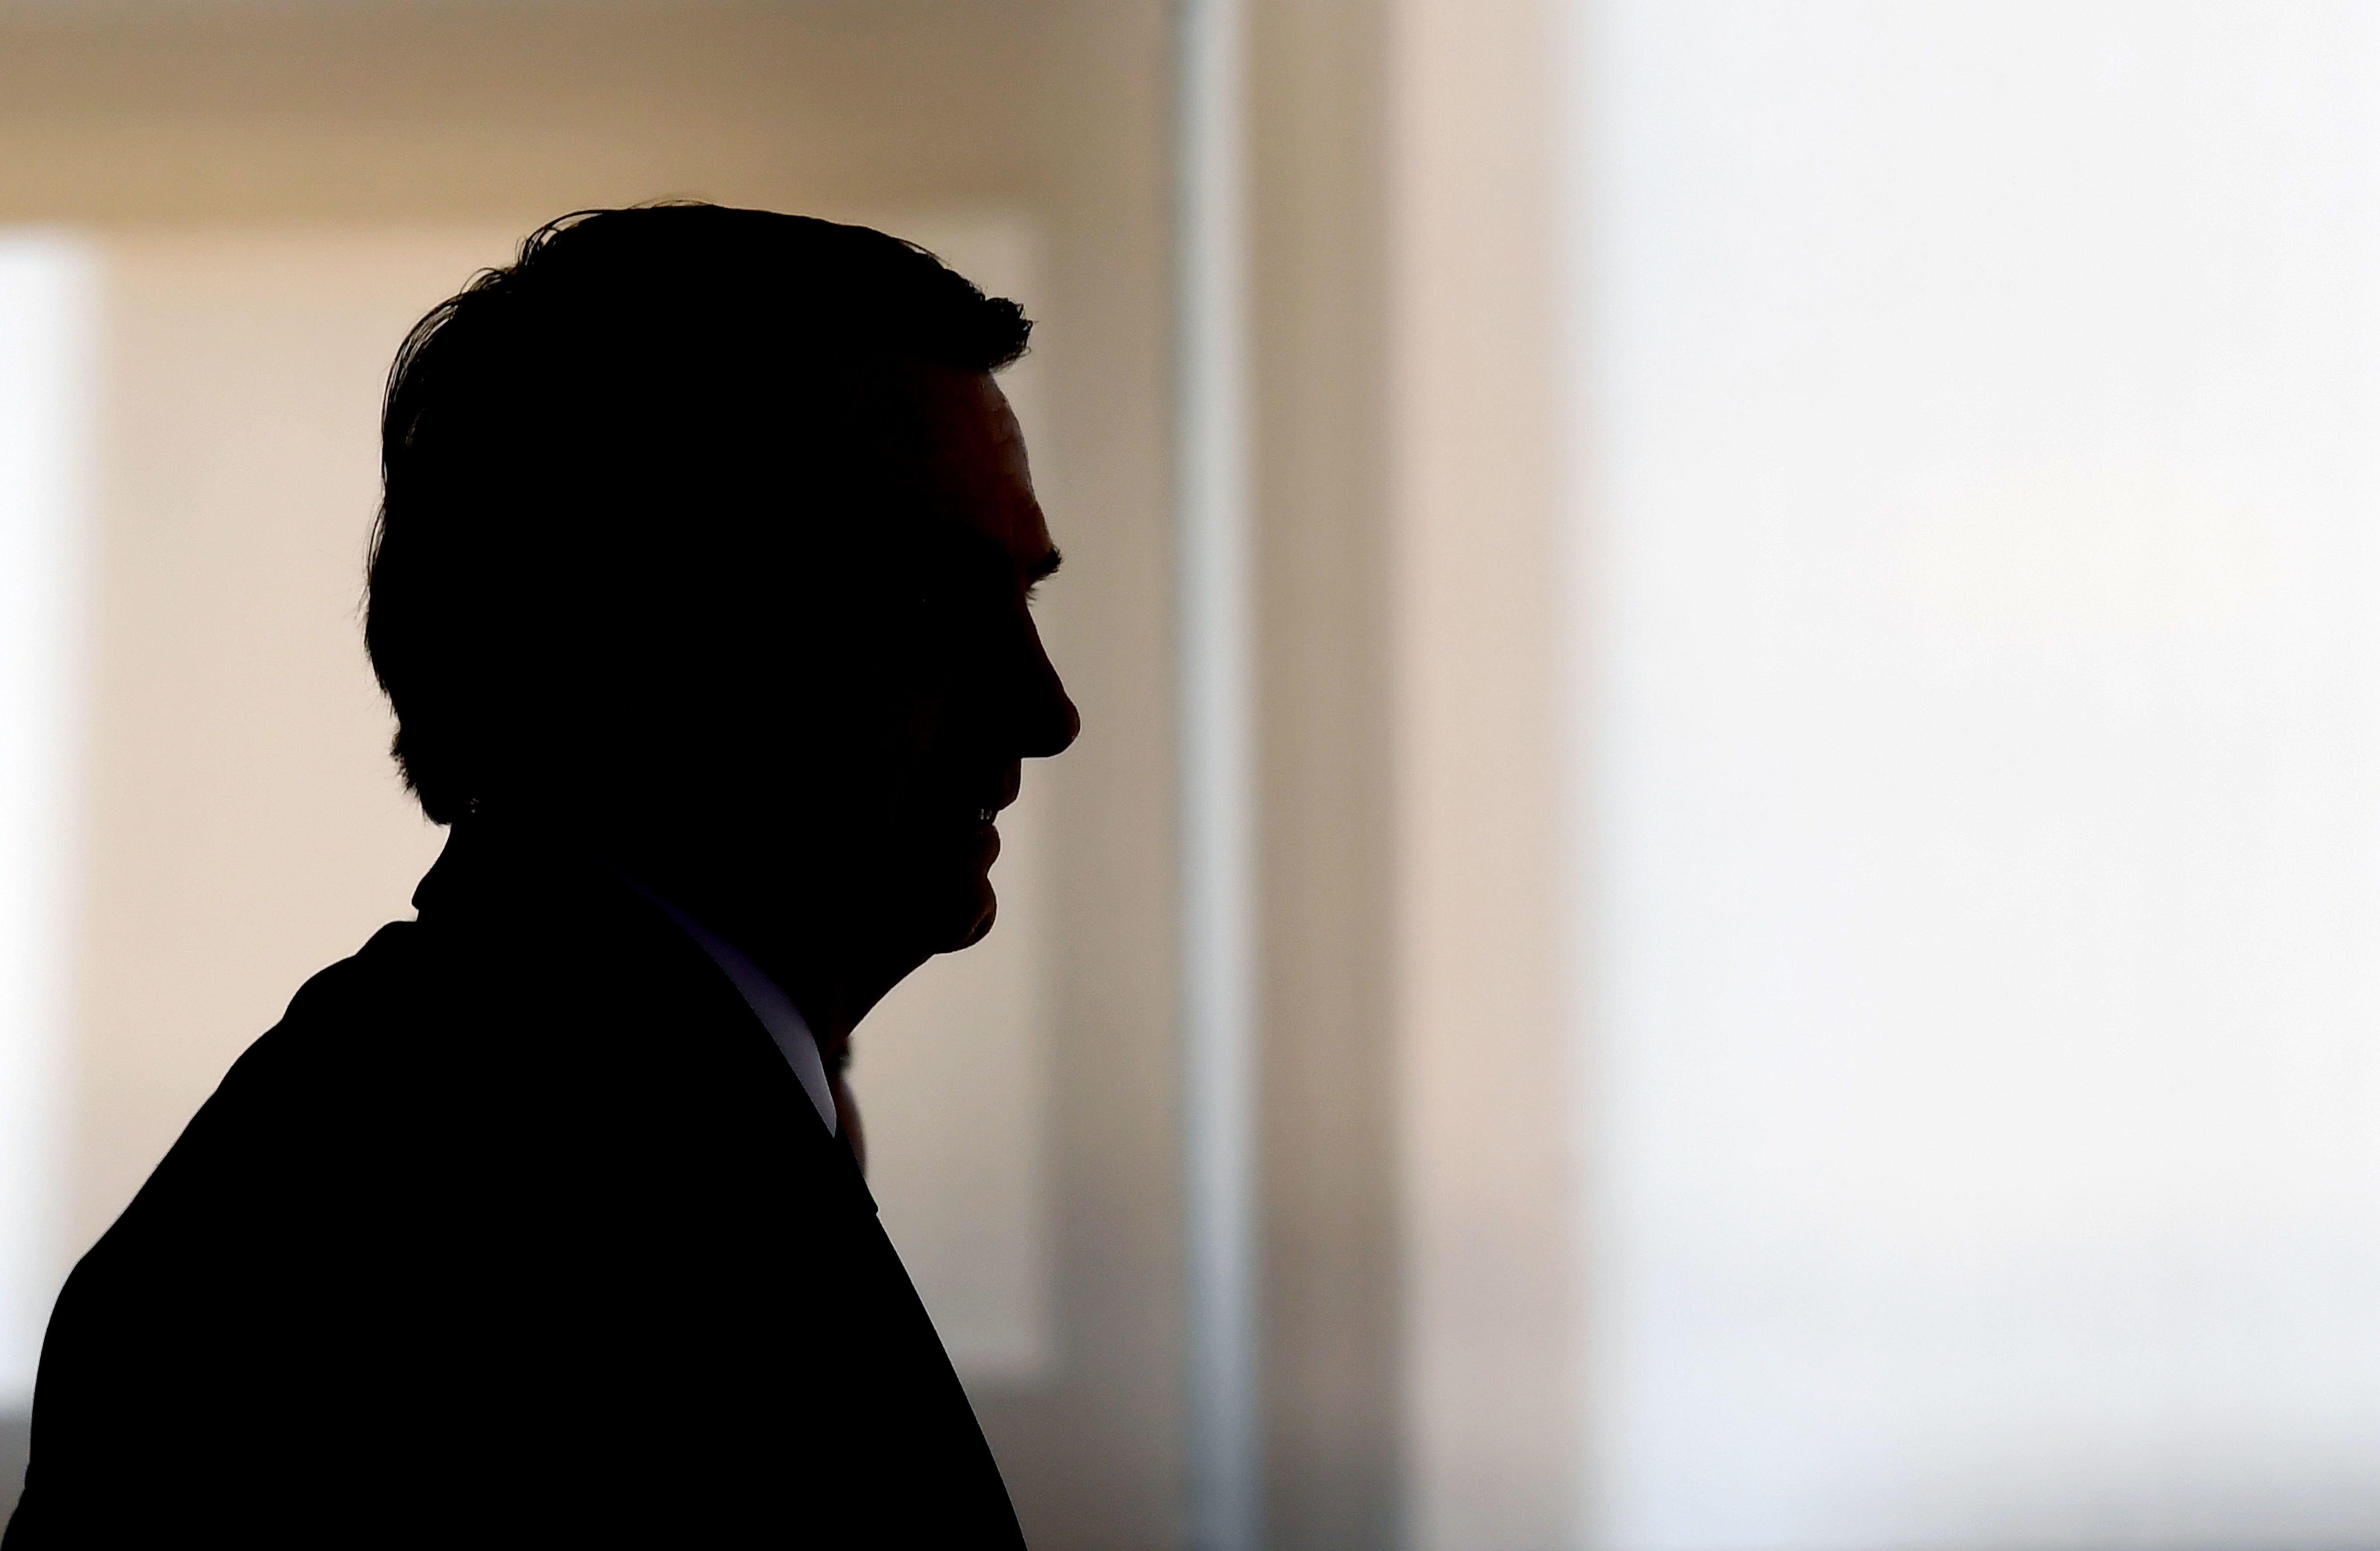 Recuos e desentendimentos públicos no governo Bolsonaro marcam 10 primeiros